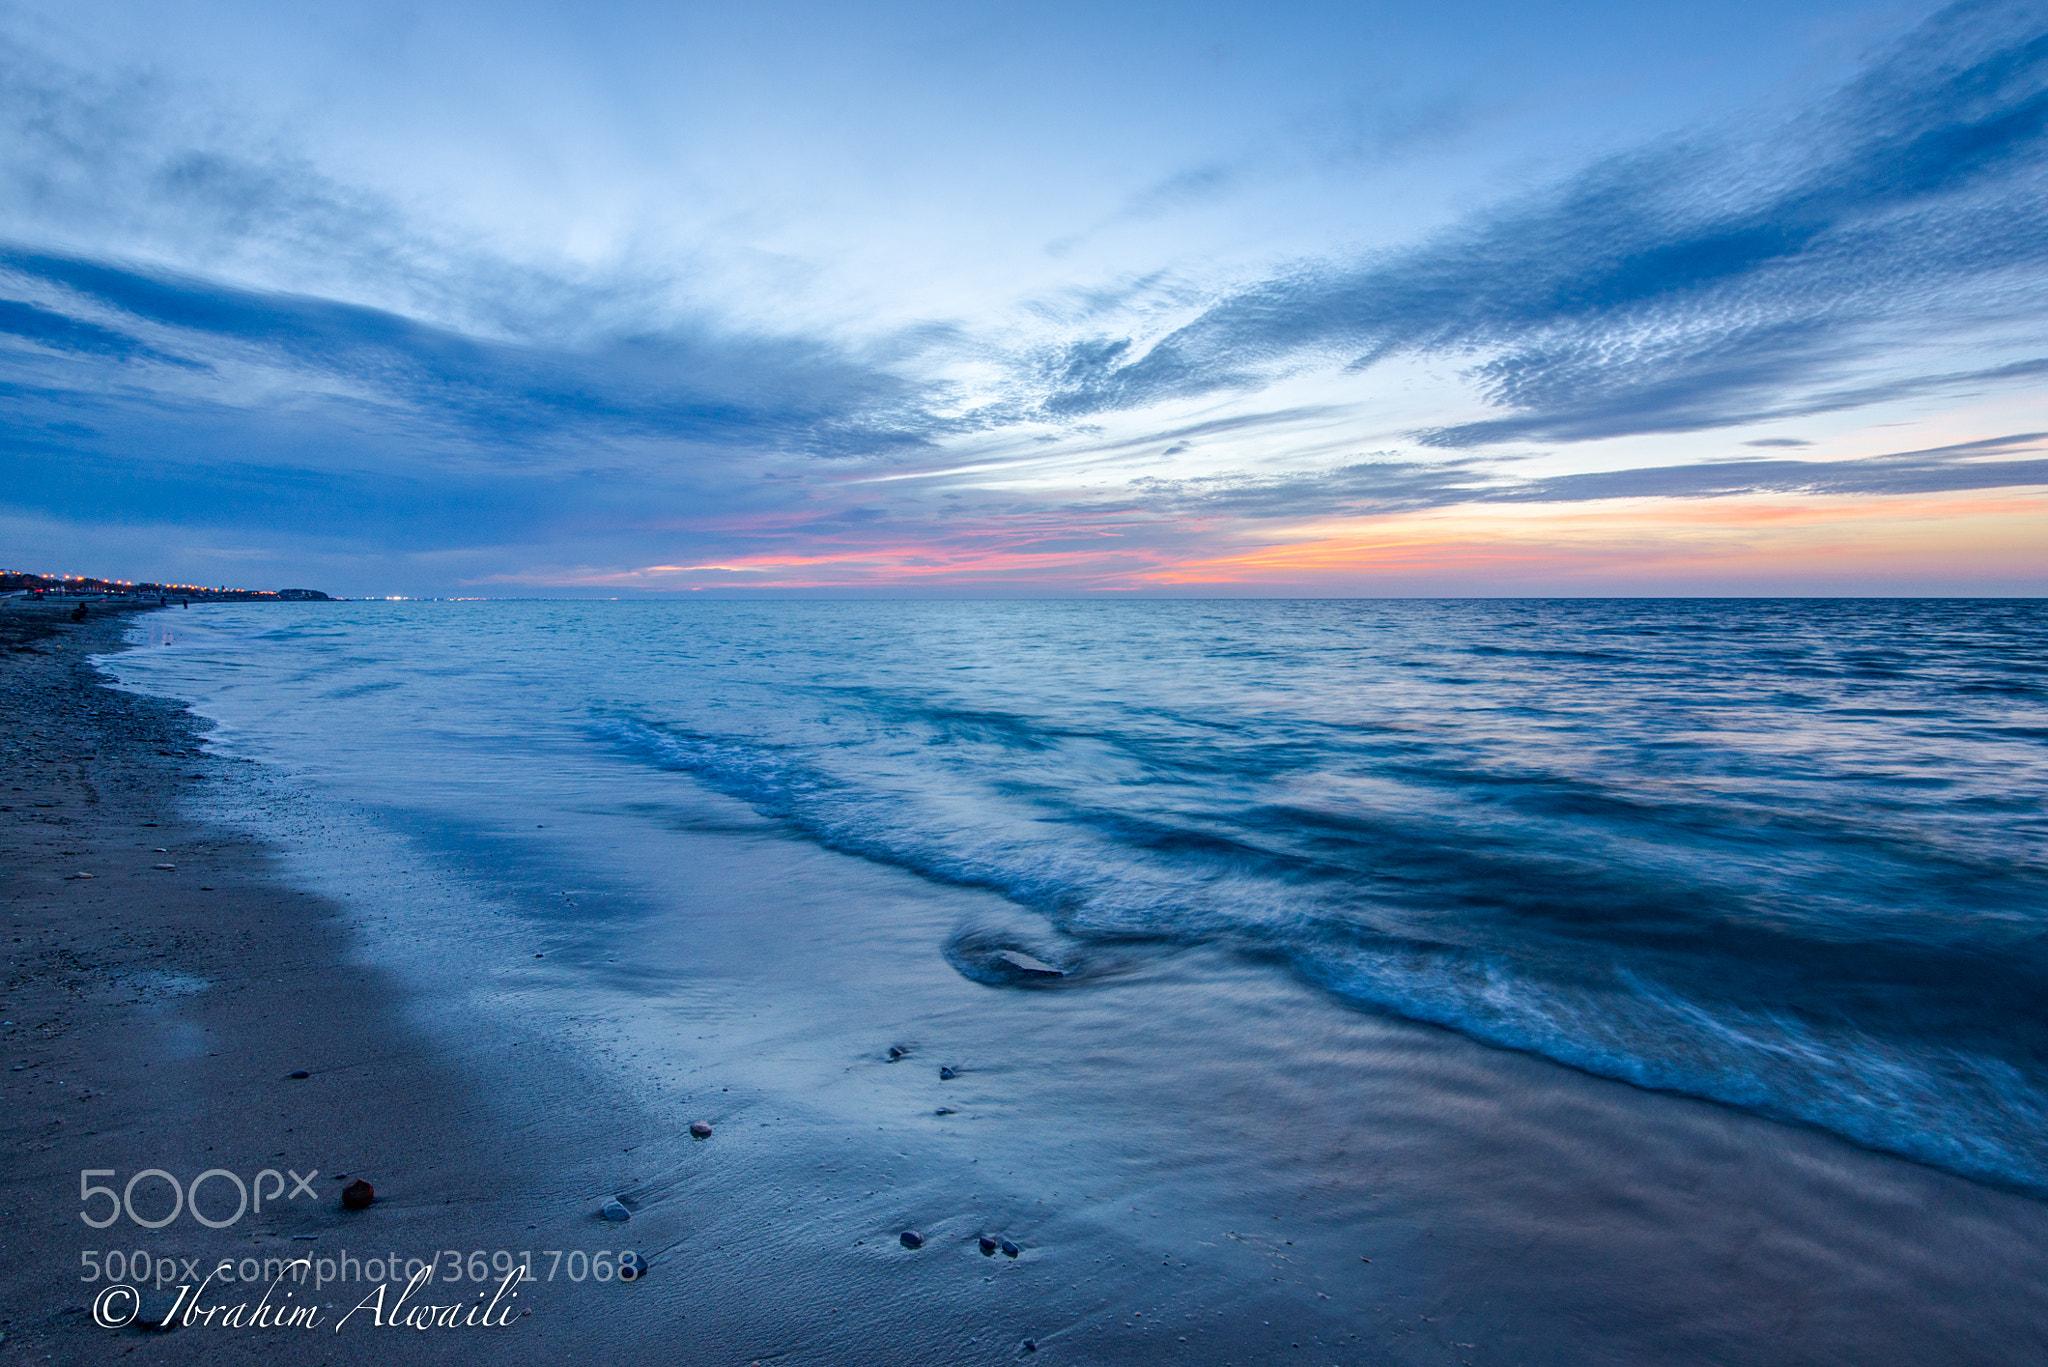 Photograph The Blue Wave by Ibrahim AlWaili on 500px